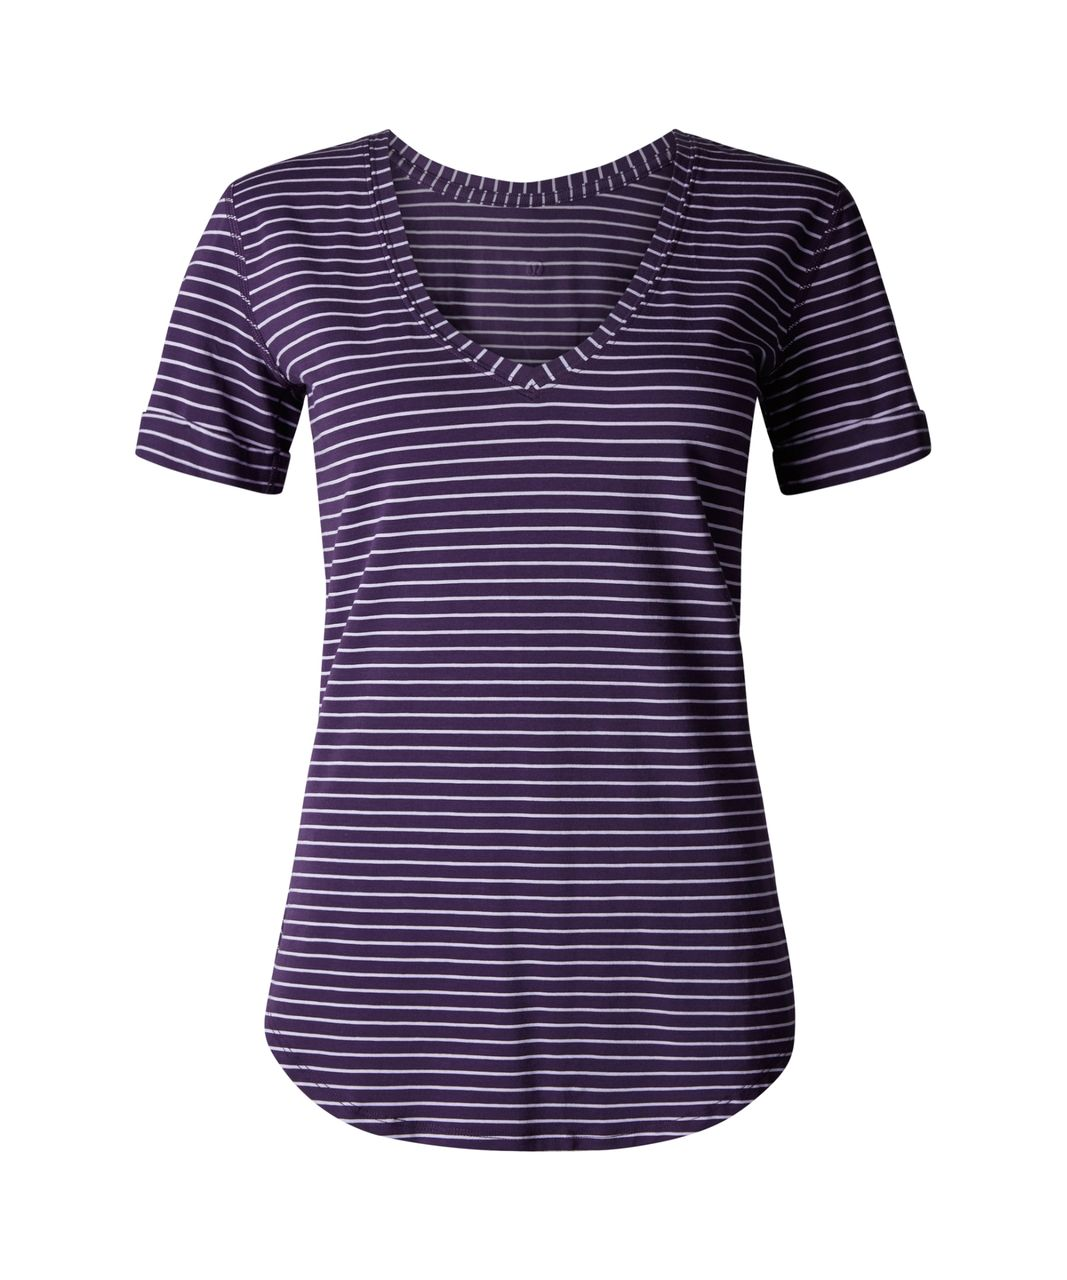 Lululemon Love Tee II - Parallel Stripe Lilac Deep Zinfandel